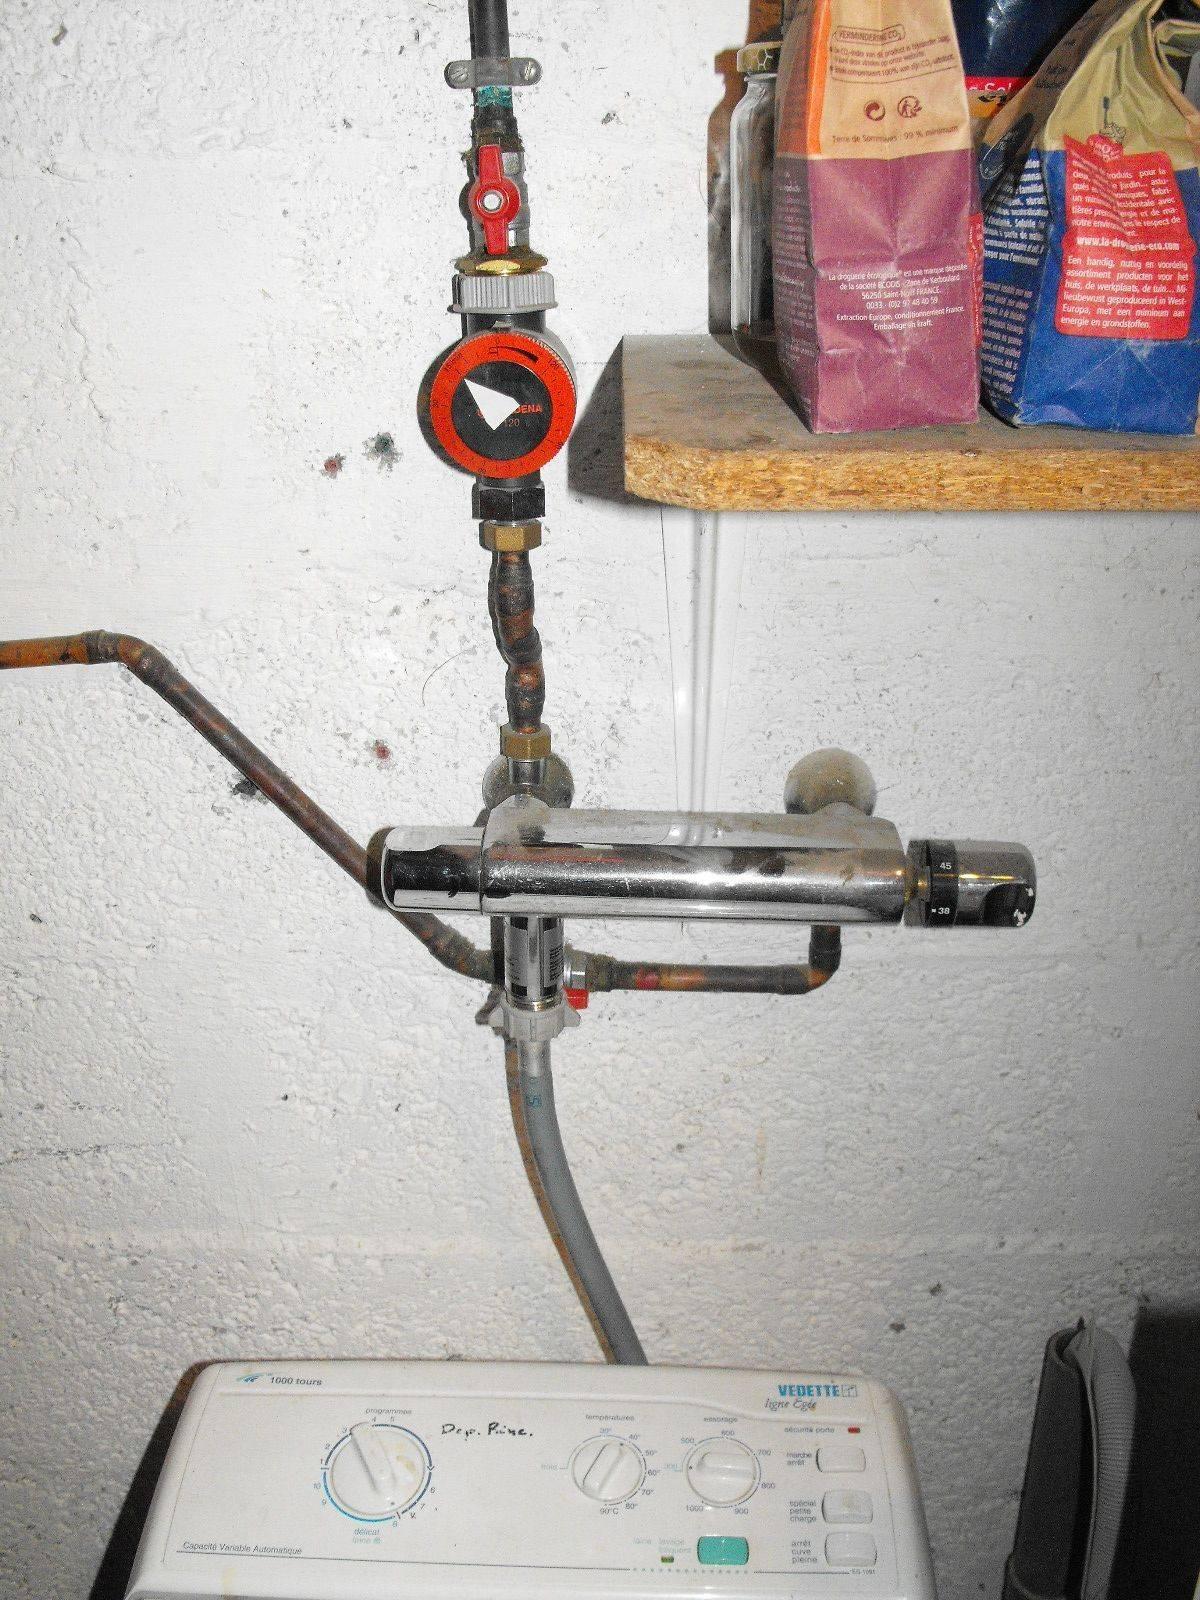 vanne machine a laver.JPG